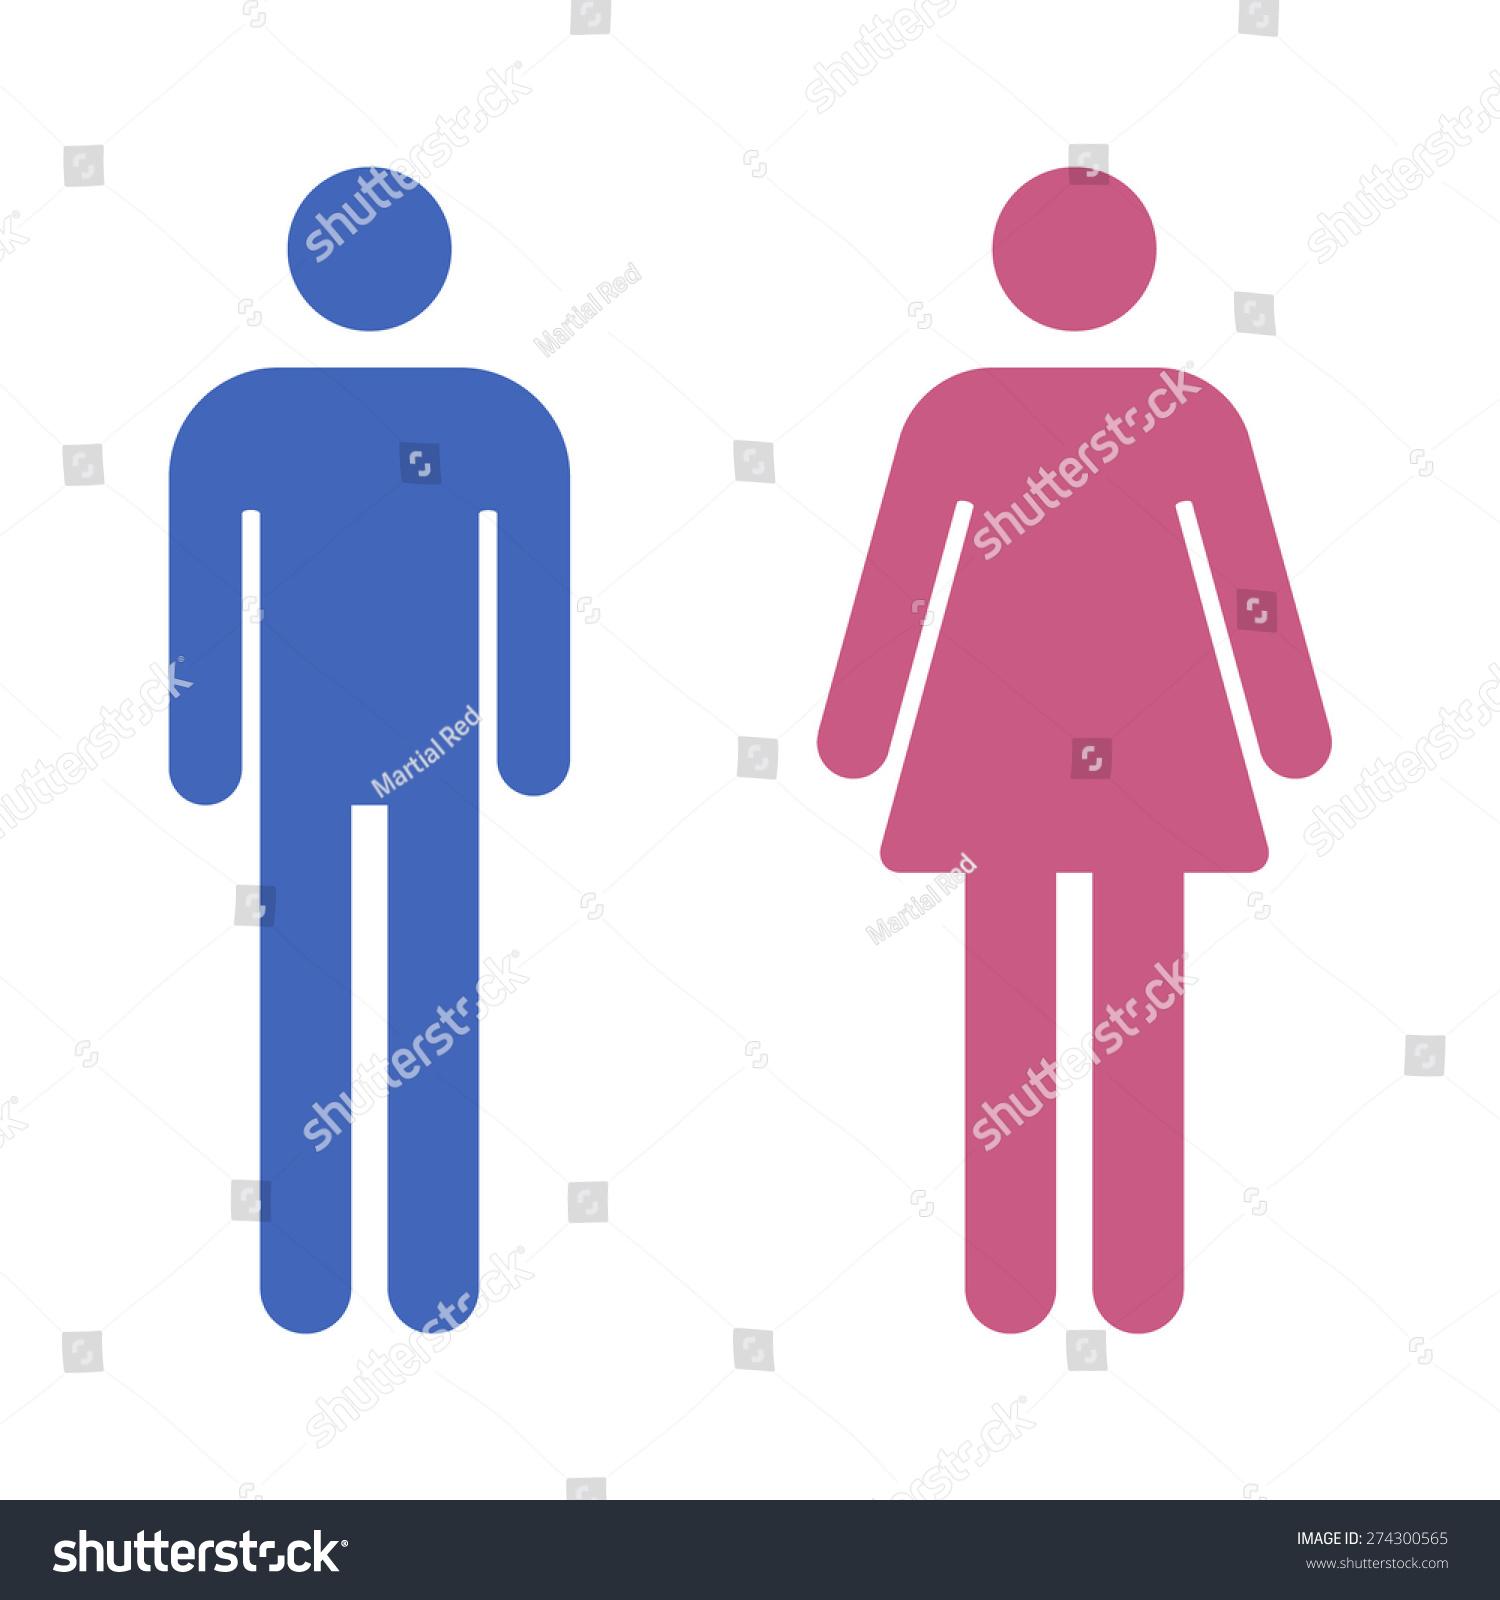 Male Female Bathroom Restroom Sign Flat Stock Photo (Photo, Vector ...